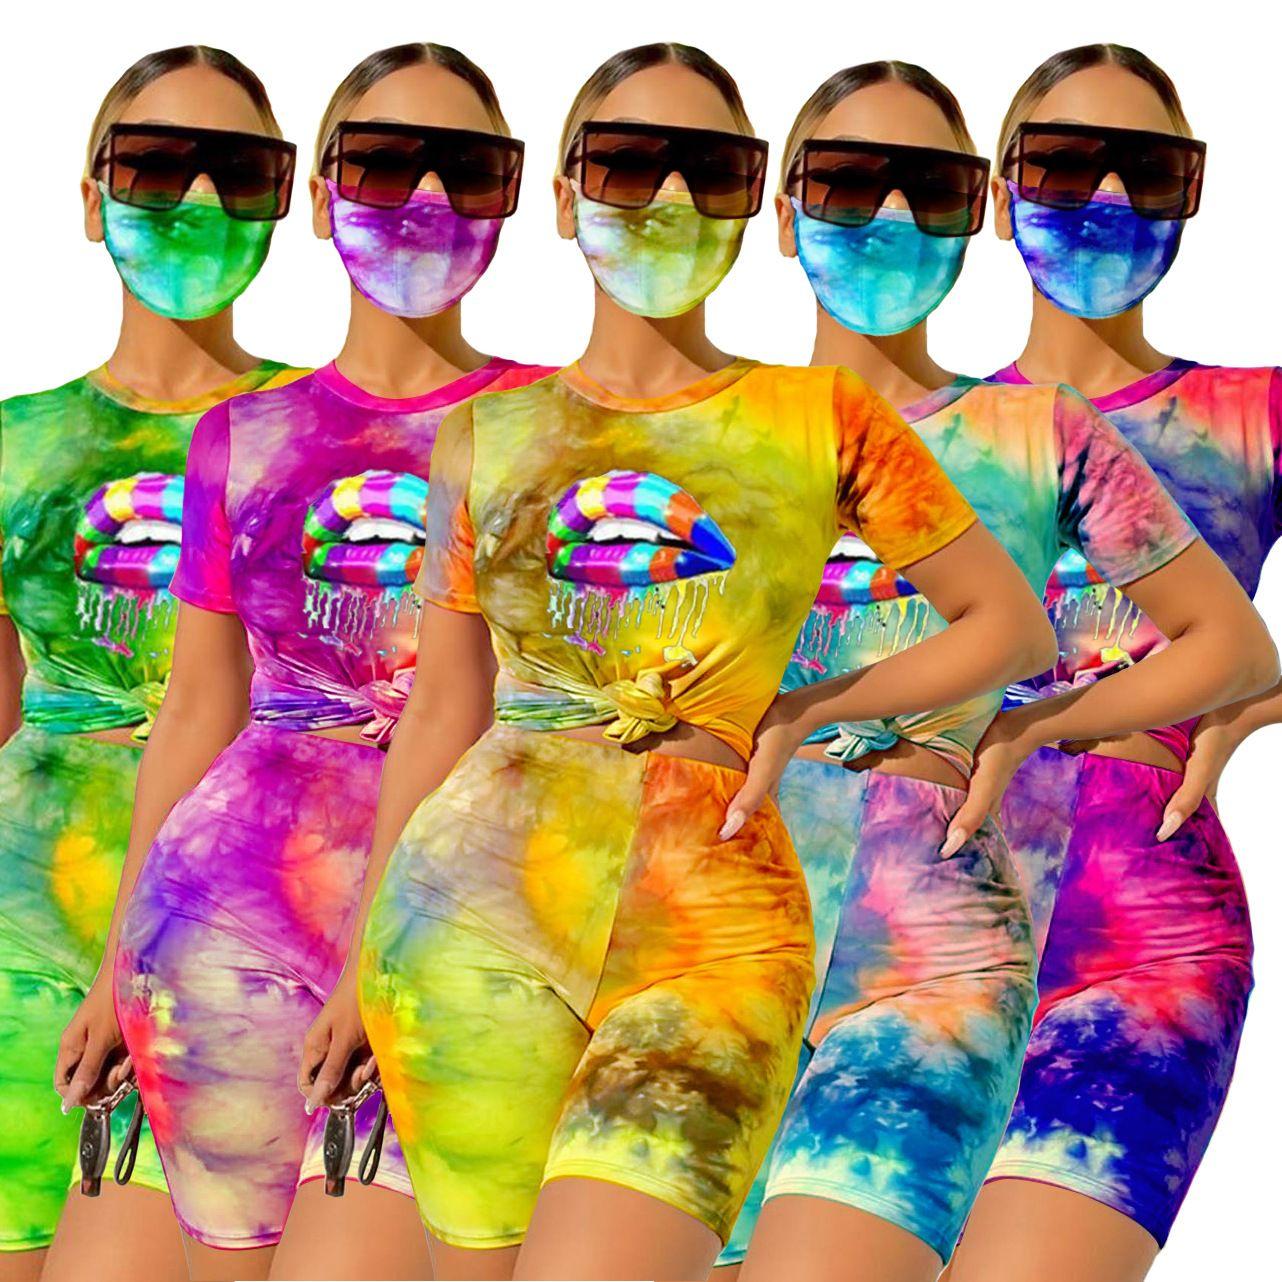 2020 Fashion Designer Stampa donne tute due pezzi set Maschera manica corta Top brevi pantaloni di usura Tie Dye Outfit Magro Outdoor